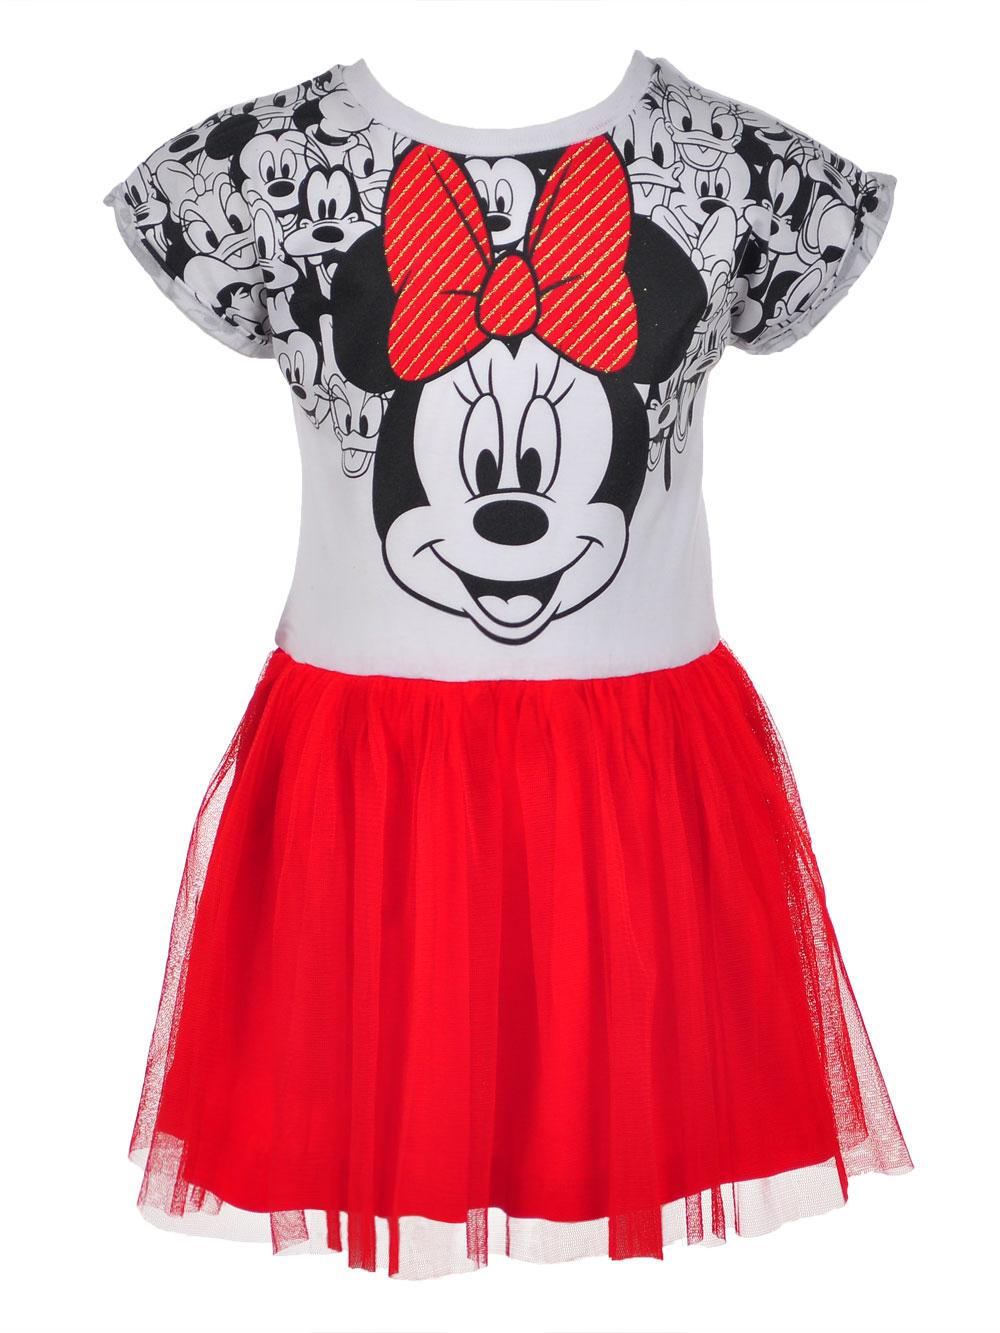 c6cefd66d8b Details about Disney Minnie Mouse Girls' Dress